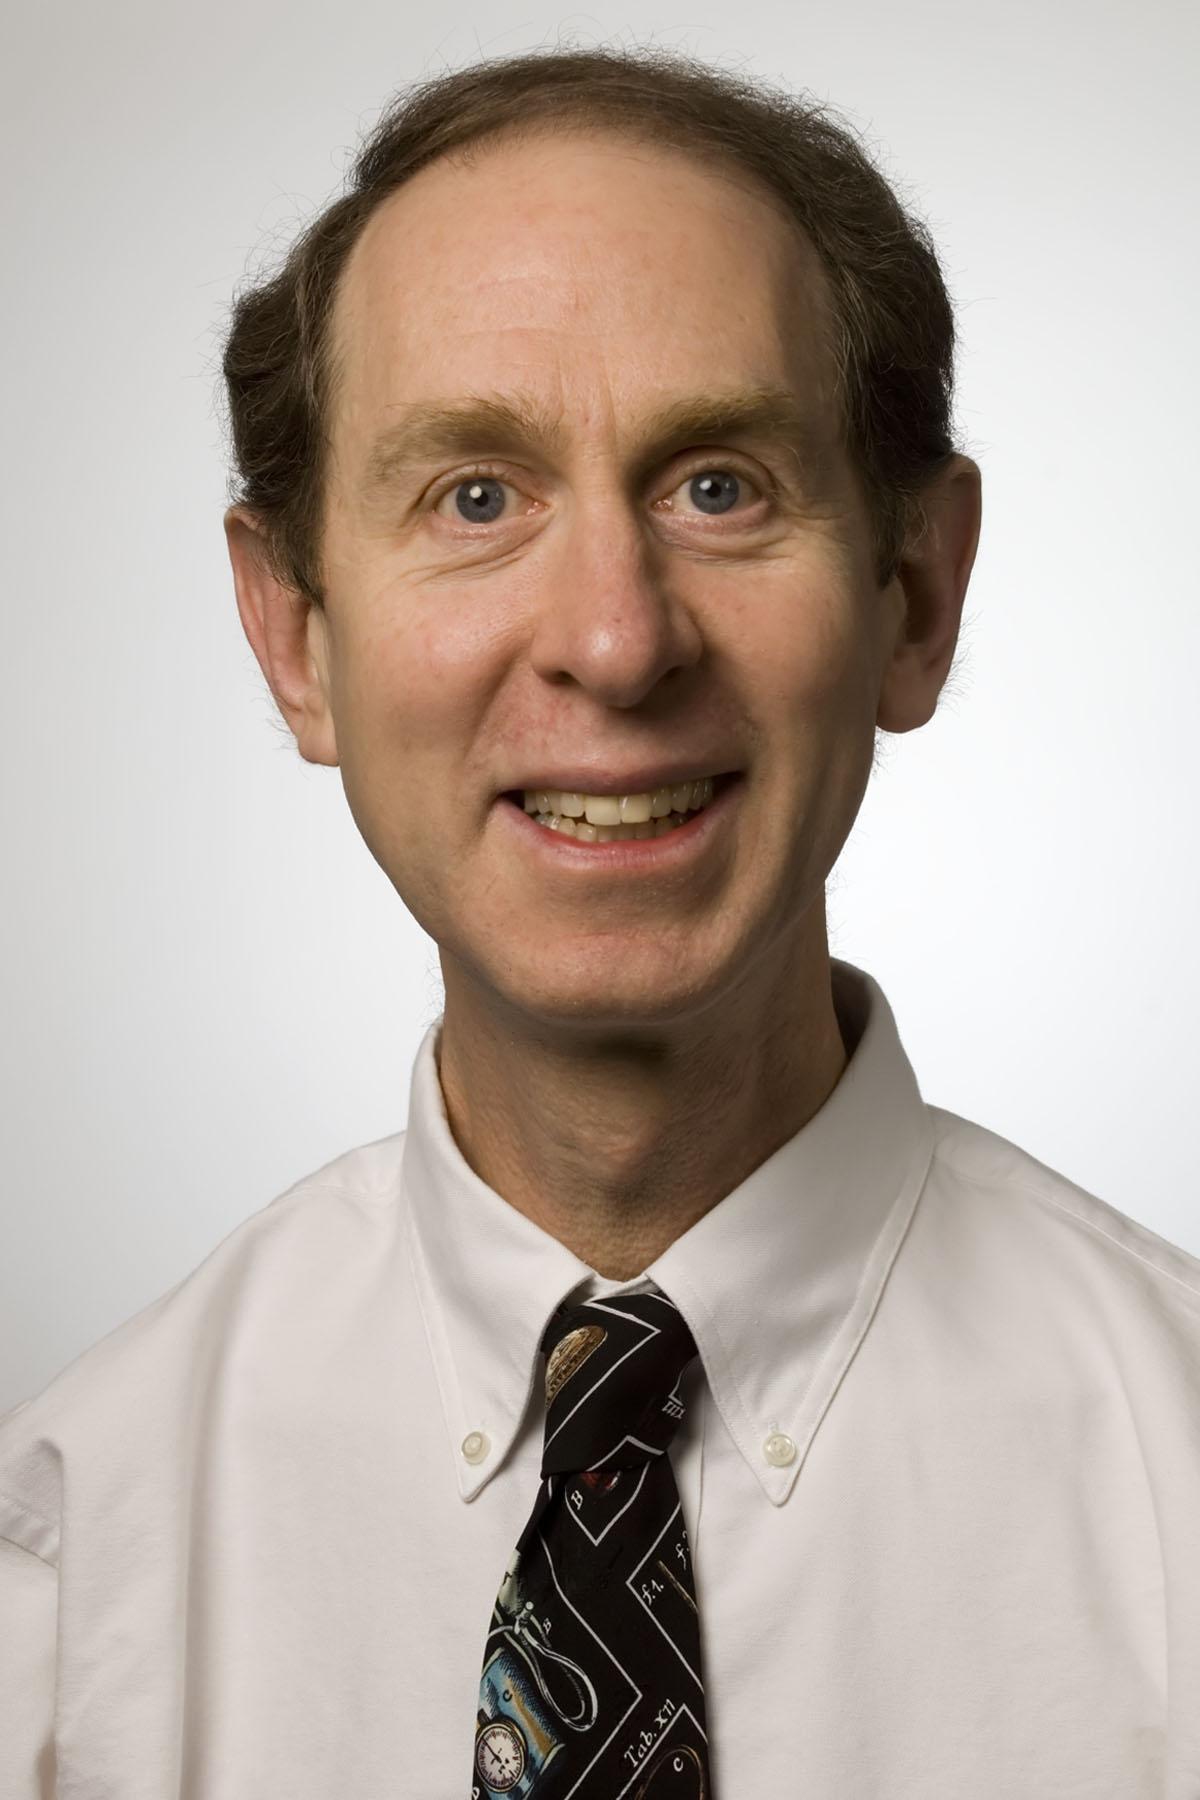 Mark Levine, MD, Vermont Health Commissioner